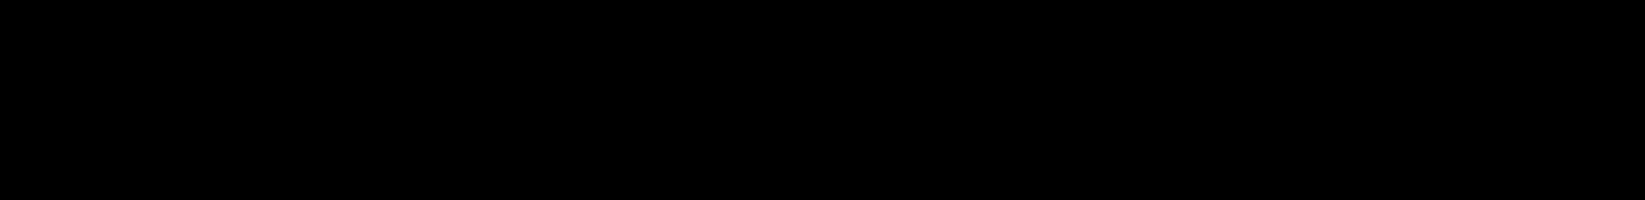 ProductionType